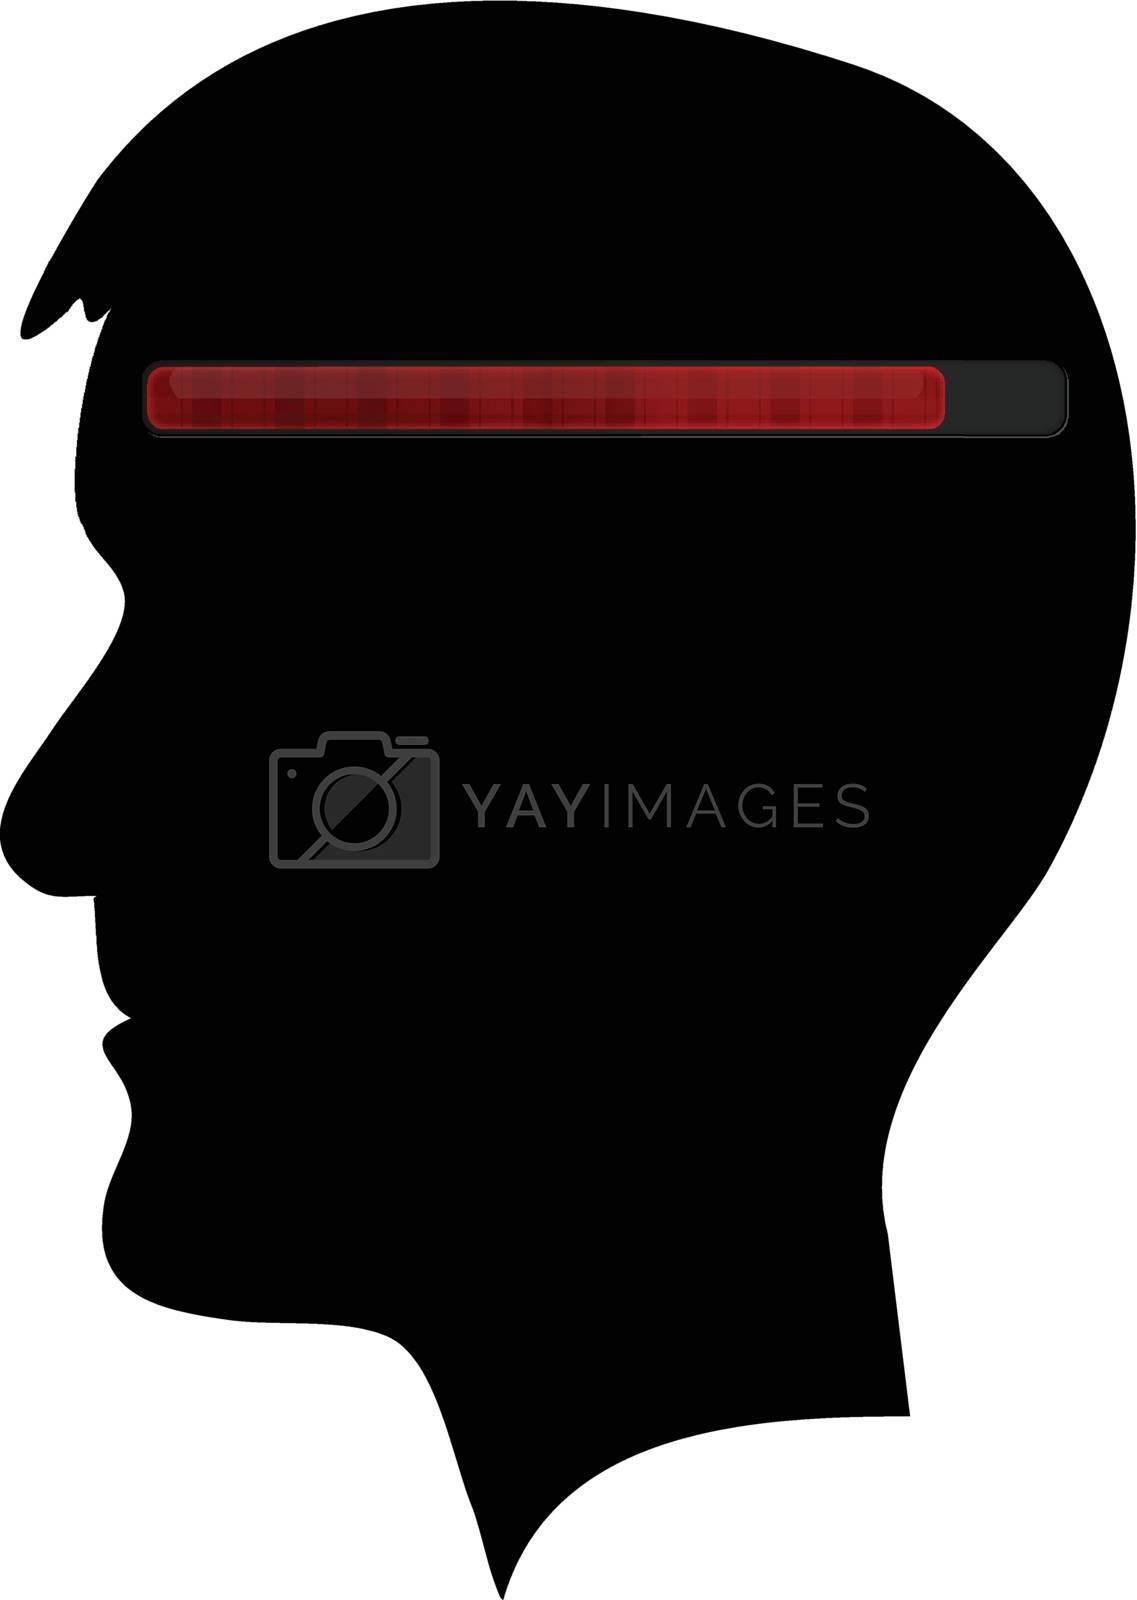 Human head black silhouette with red progress bar